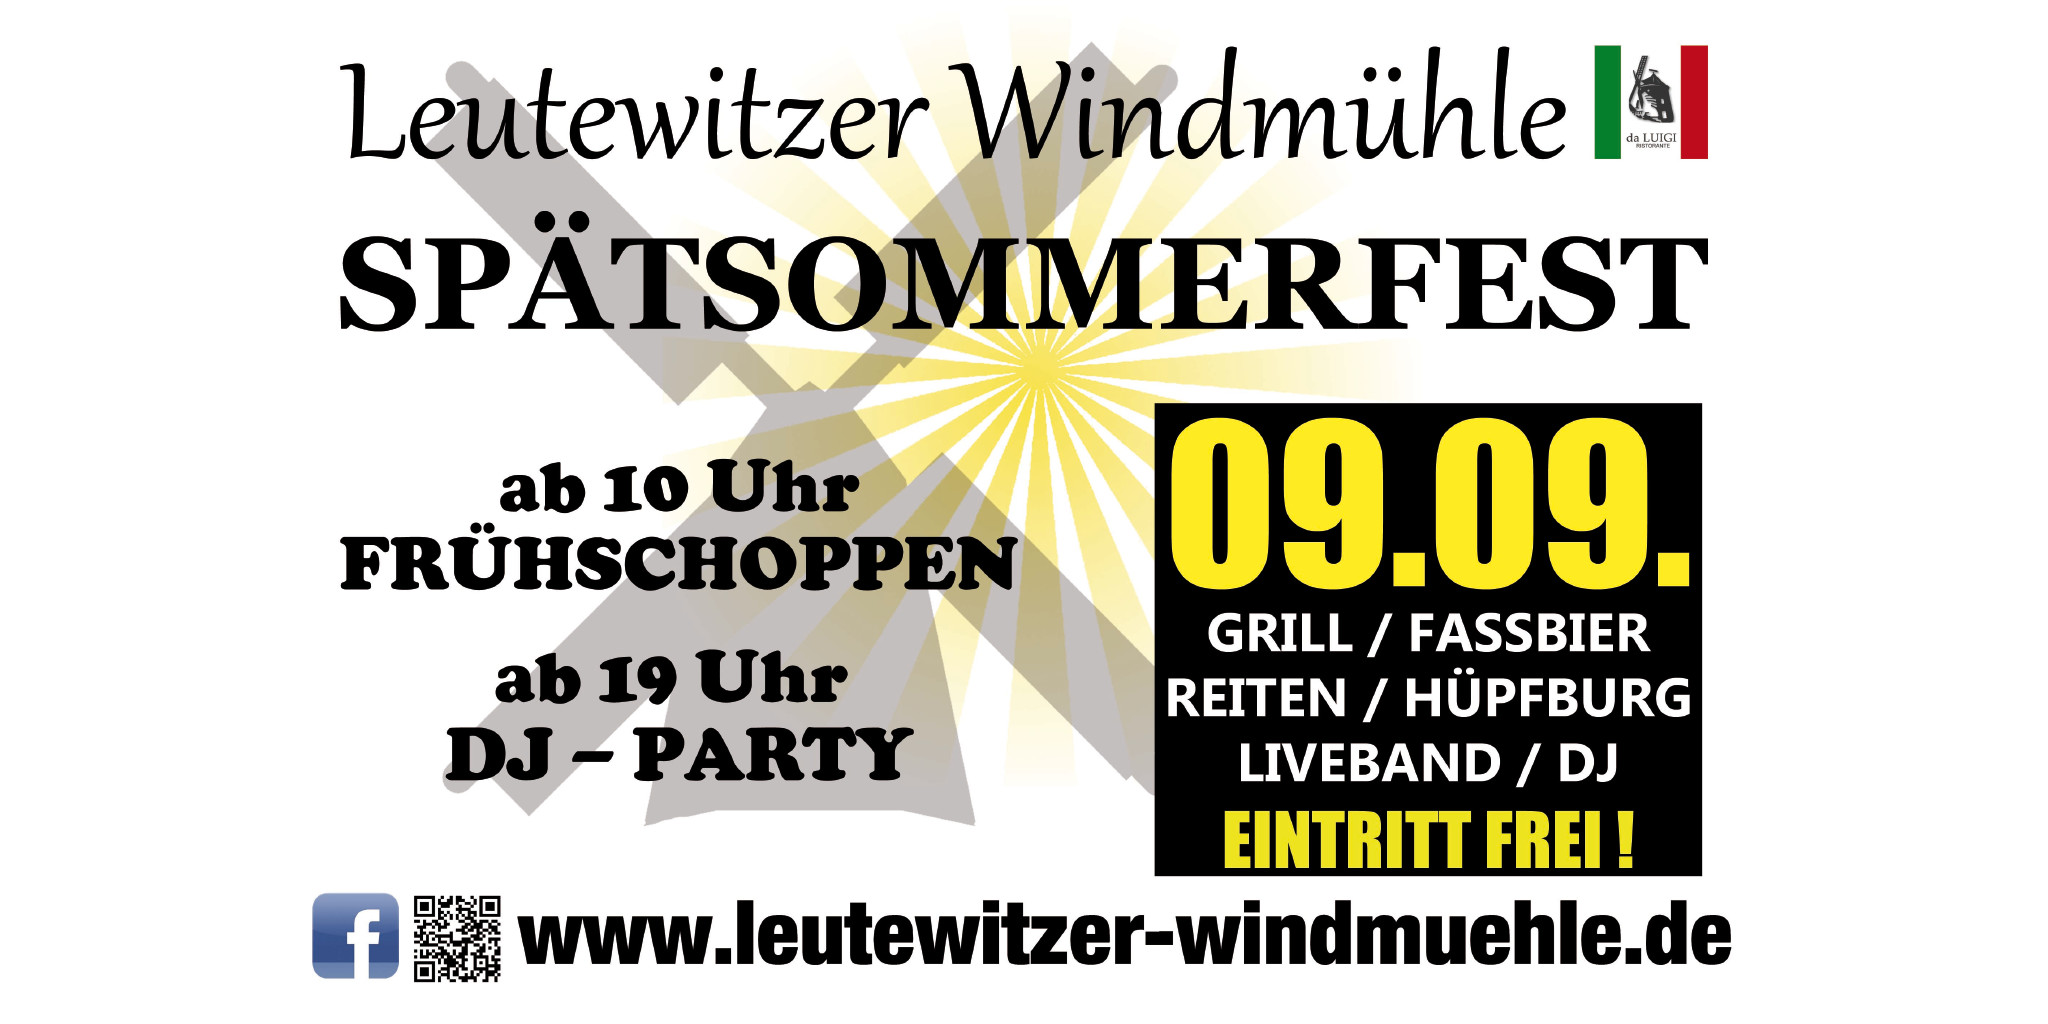 Spätsommerfest Leutewitzer Windmühle mit Liveband & DJ